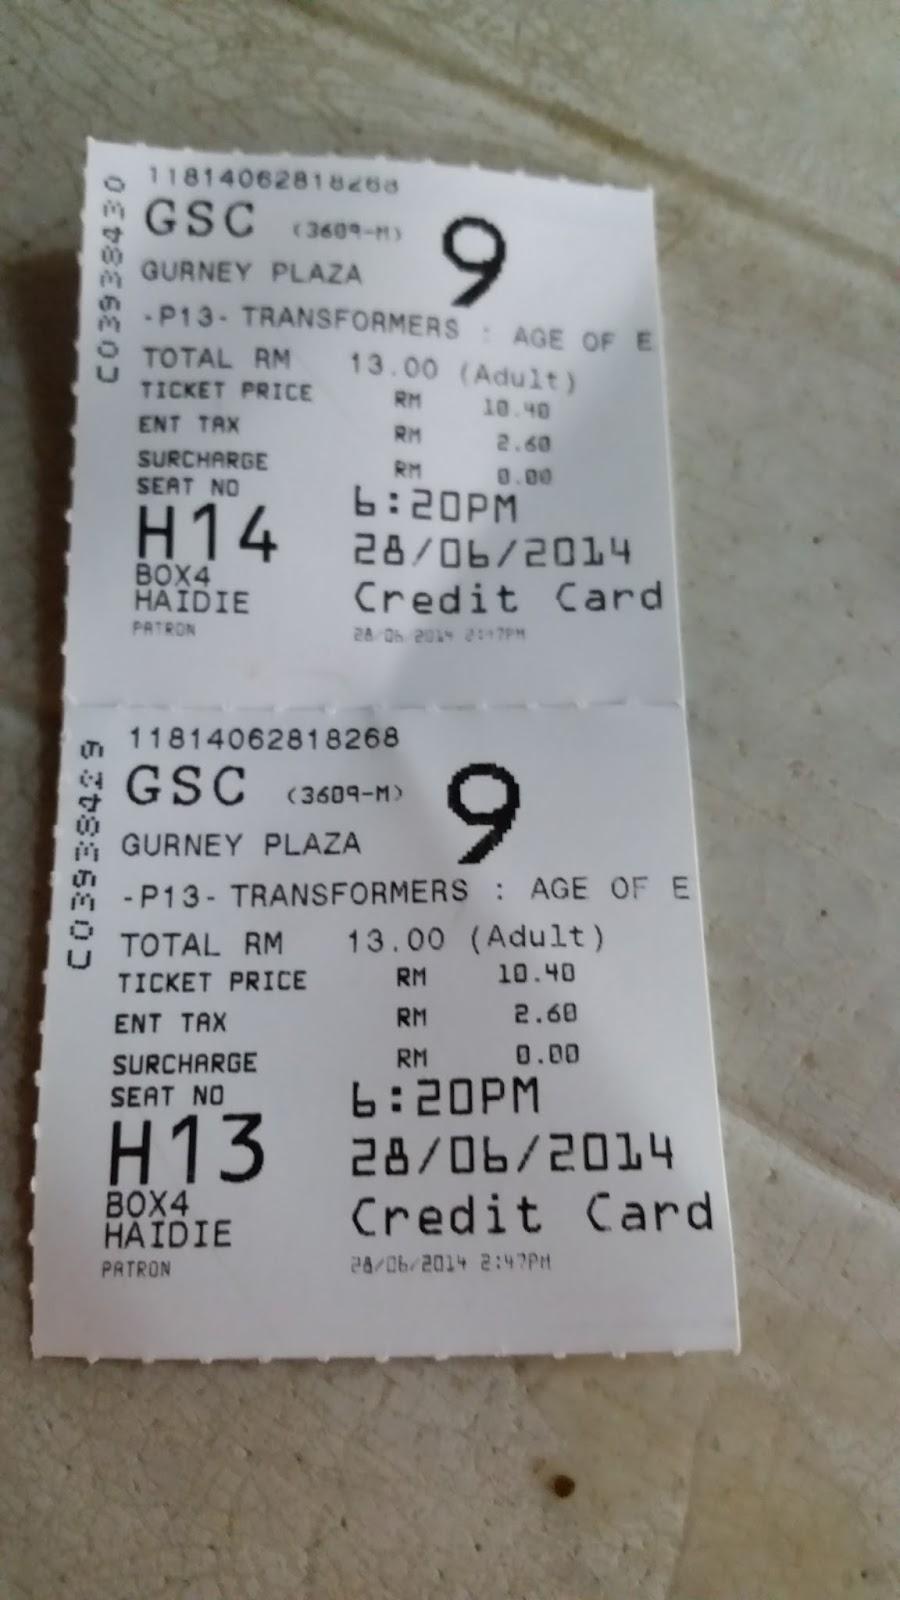 our journey penang gurney plaza gsc cinema